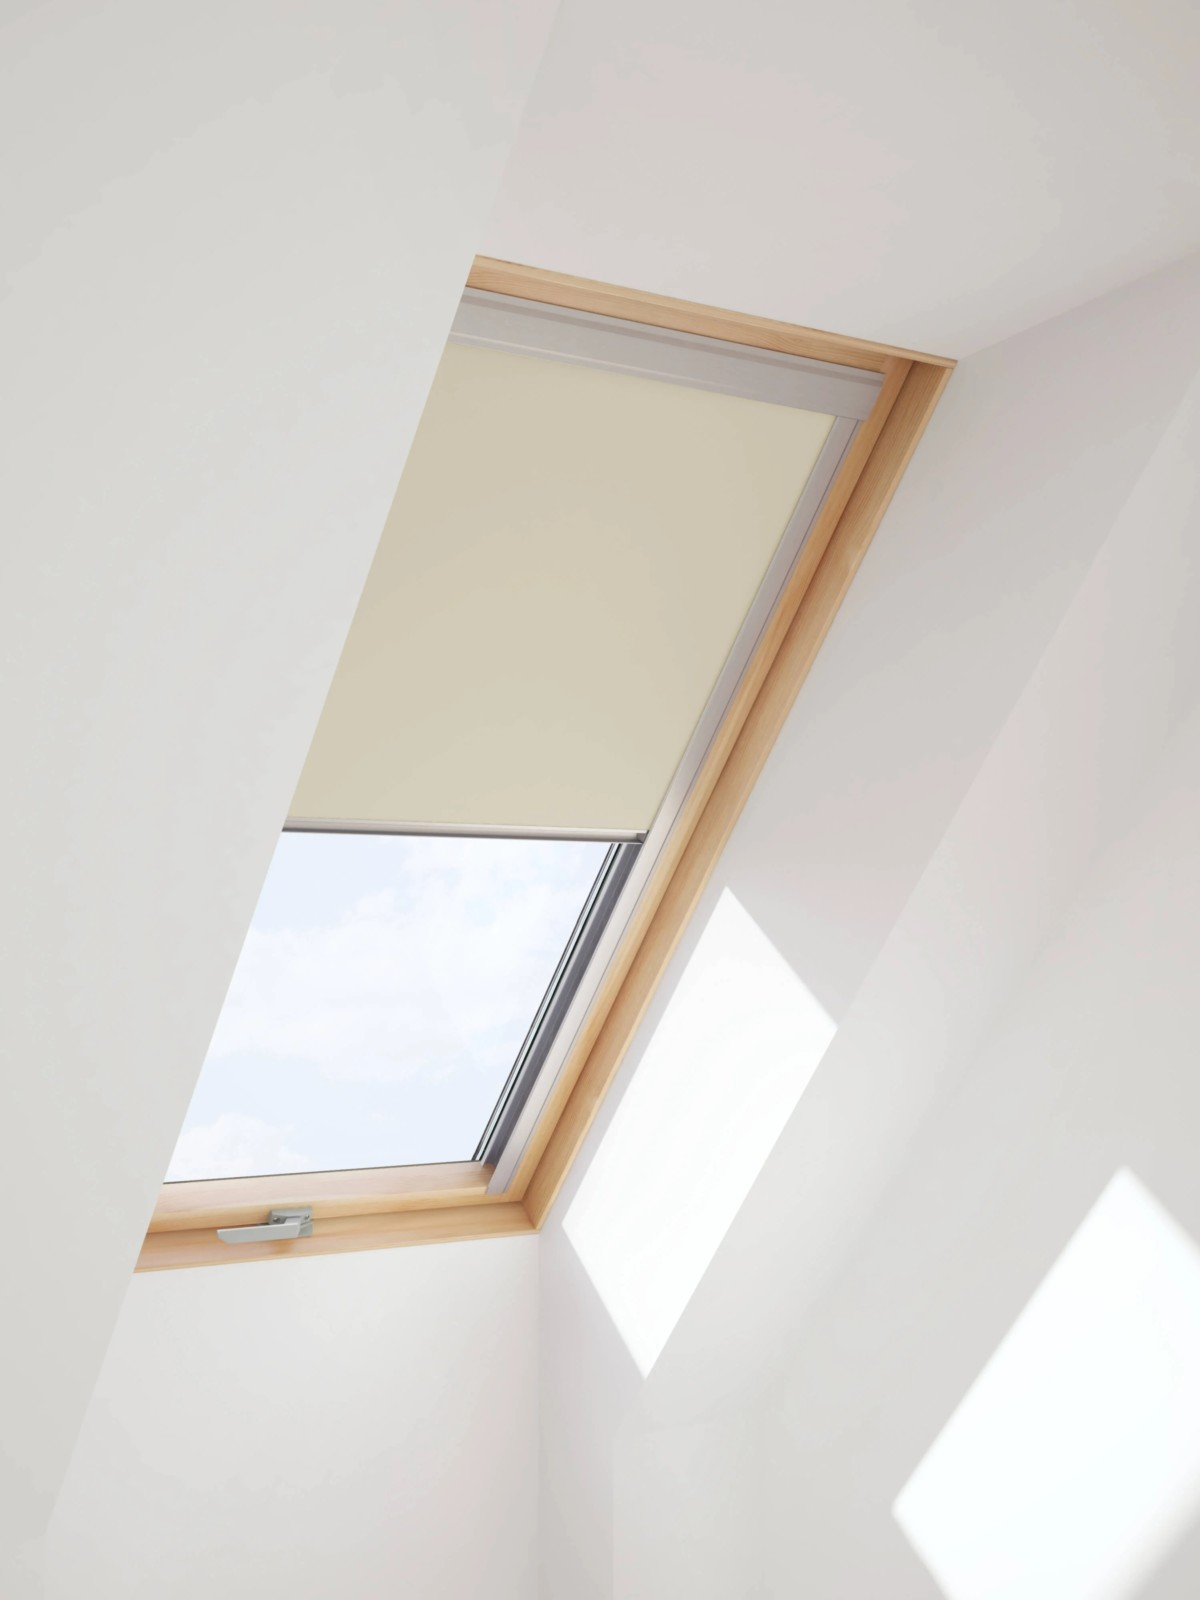 RoofLITE+ Blackout Blinds